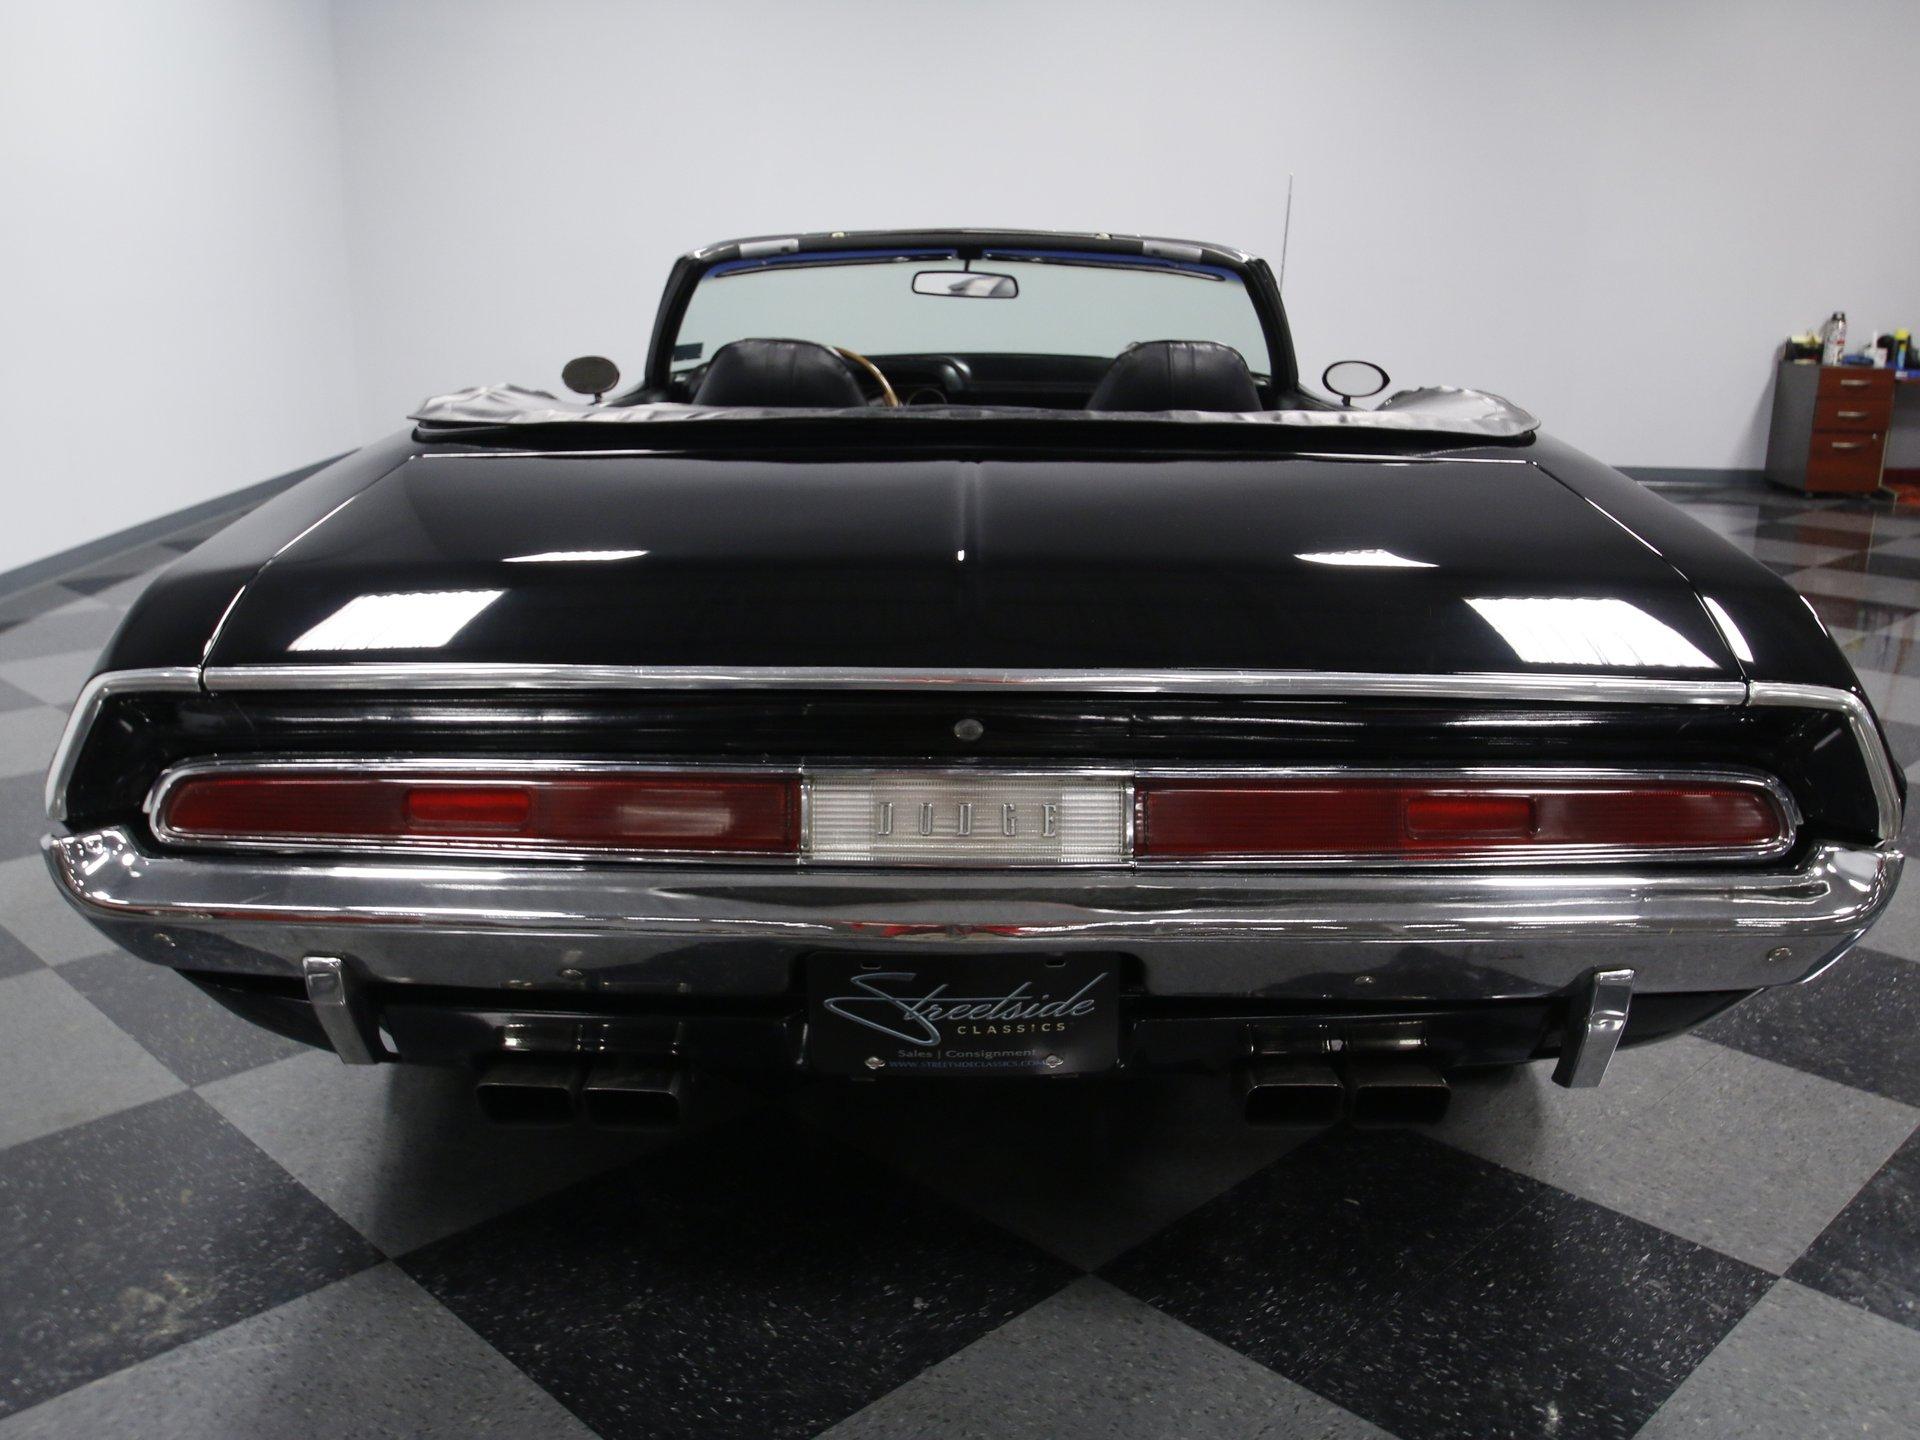 1970 Dodge Challenger | Streetside Classics - The Nation's